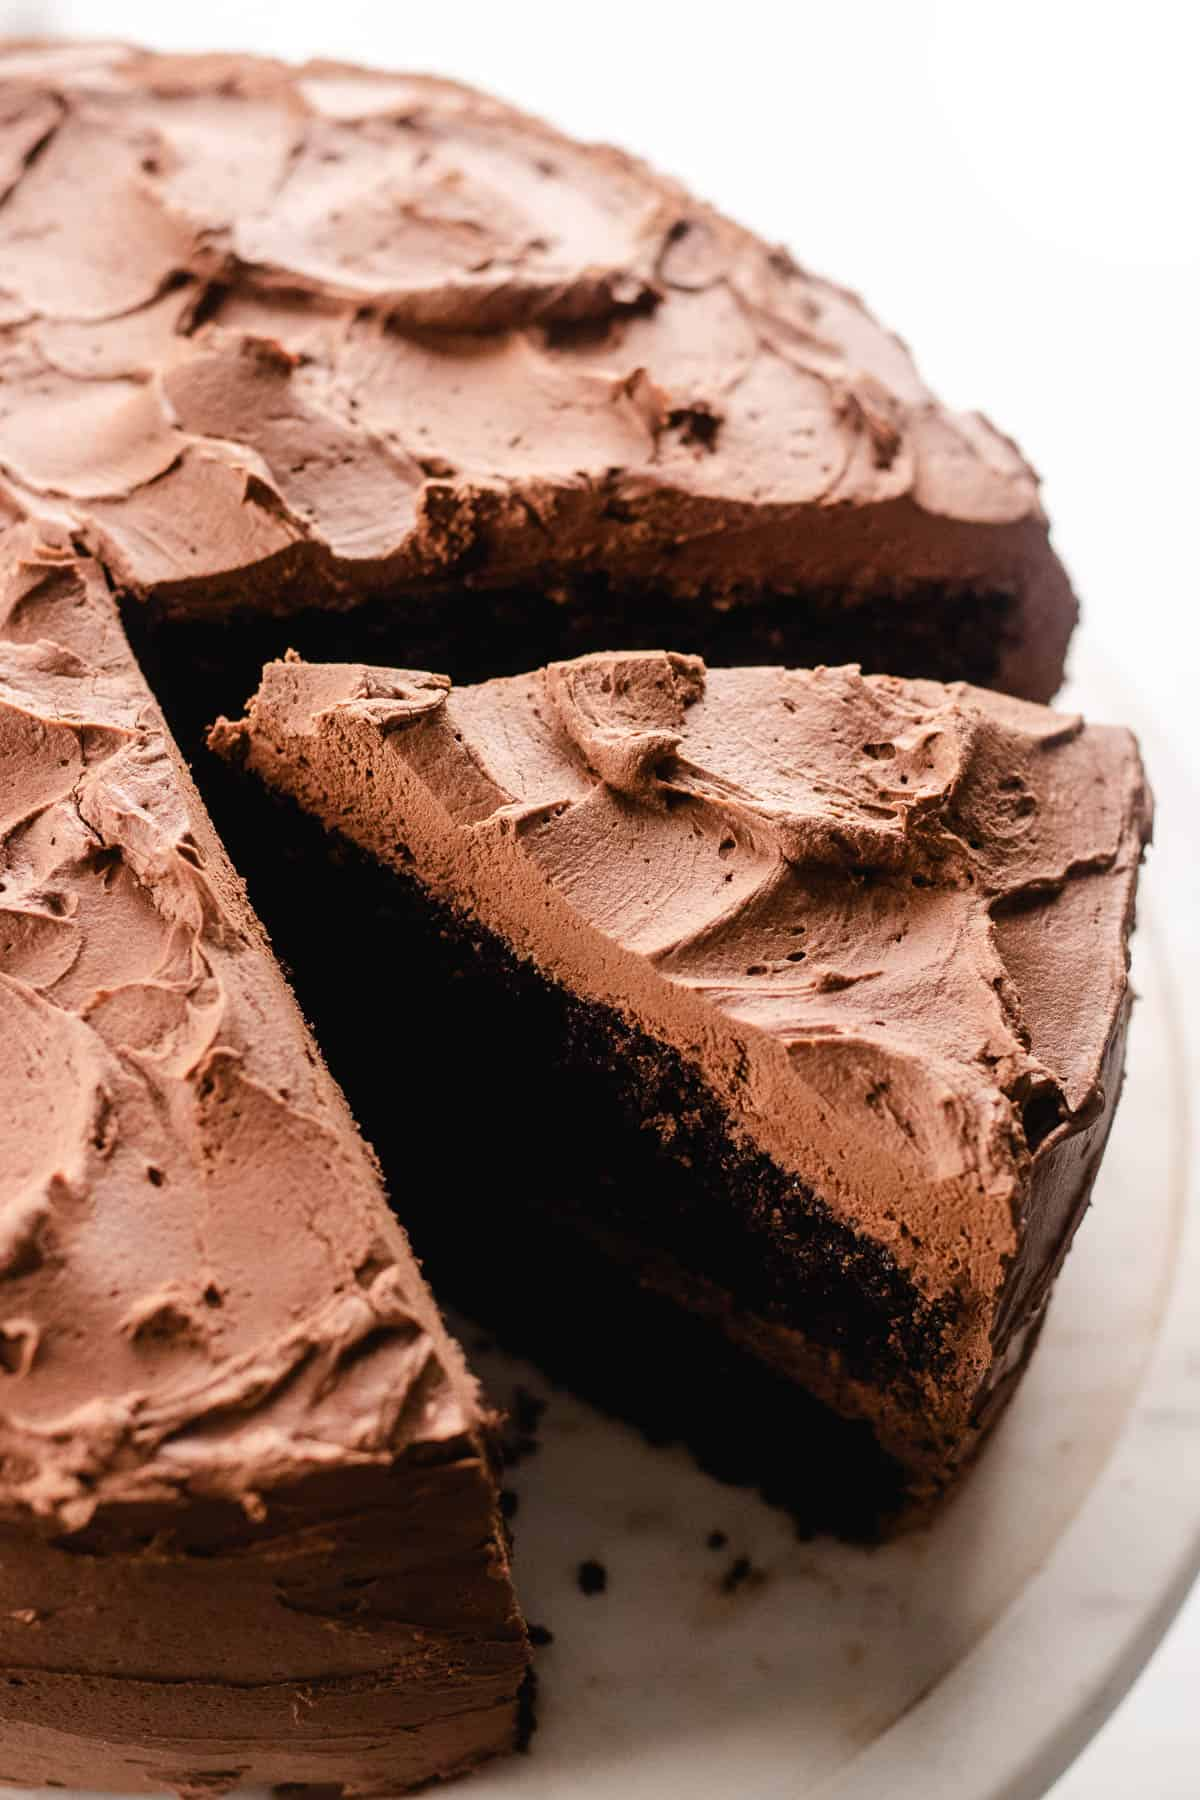 A precut chocolate cake on a platter.